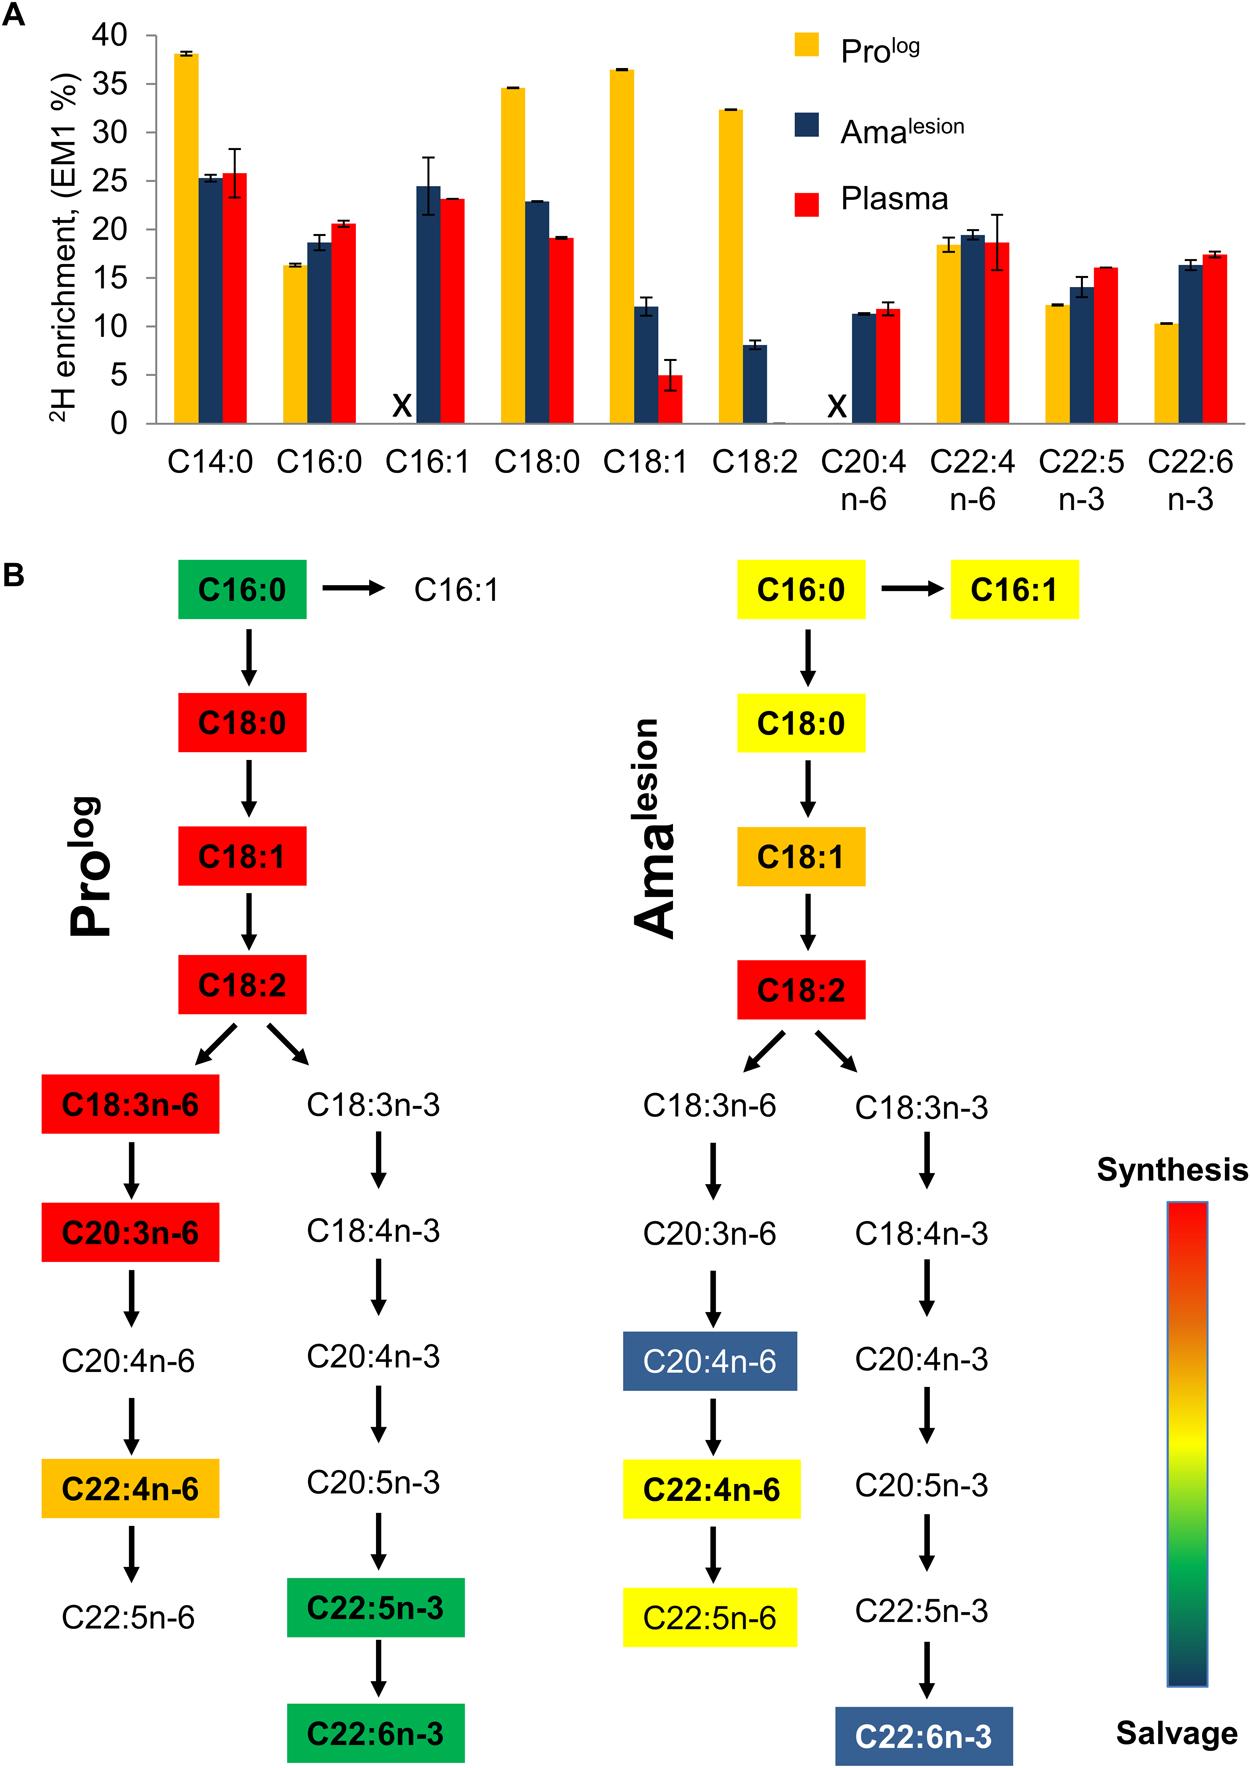 Lesion amastigotes utilize both salvage and <i>de novo</i> biosynthetic pathways to supply their fatty acid needs.